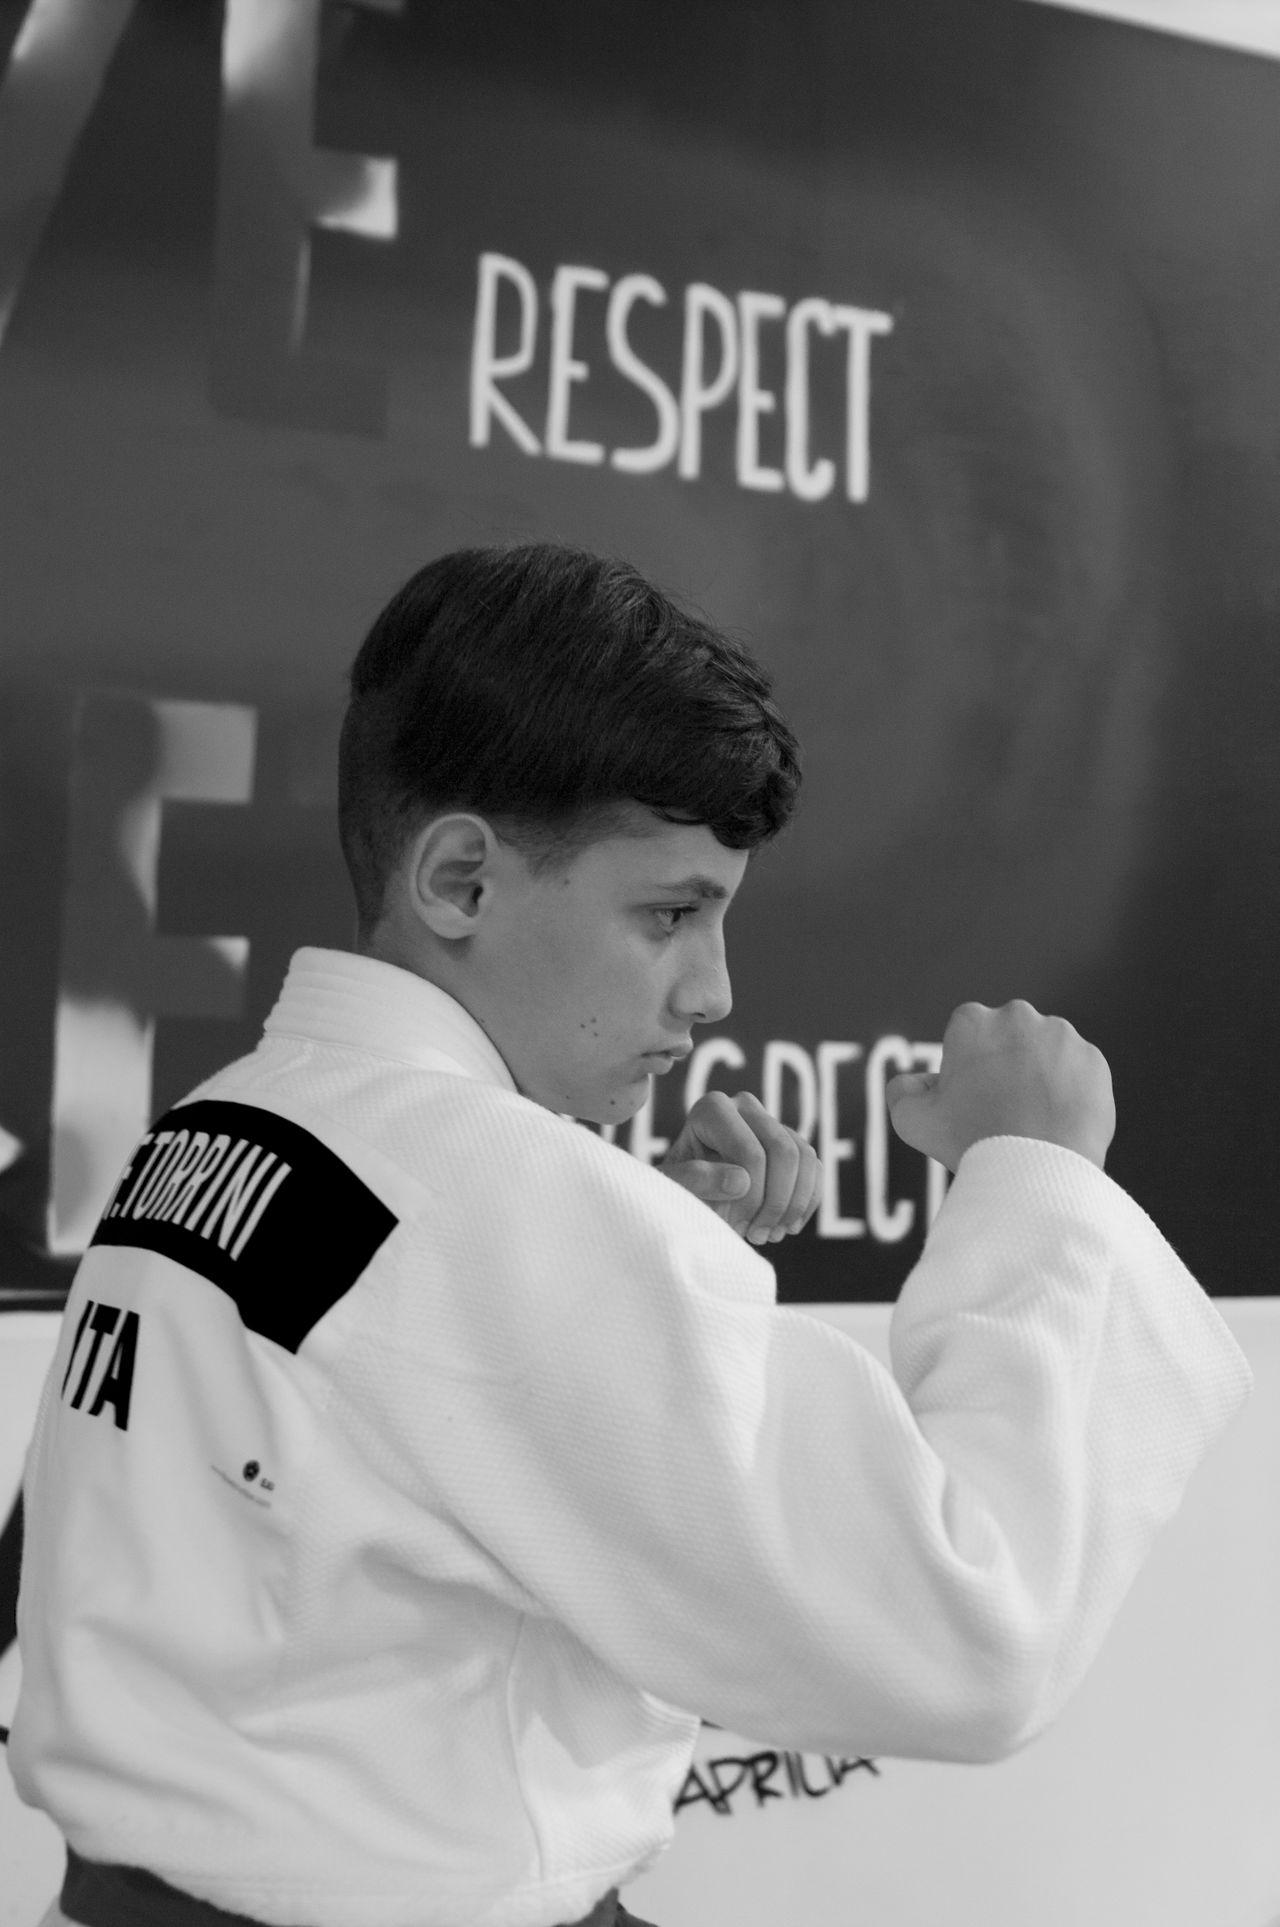 Judo Judoka Judo Is Life Judoeducazione Judoismylife my son...mio figlio